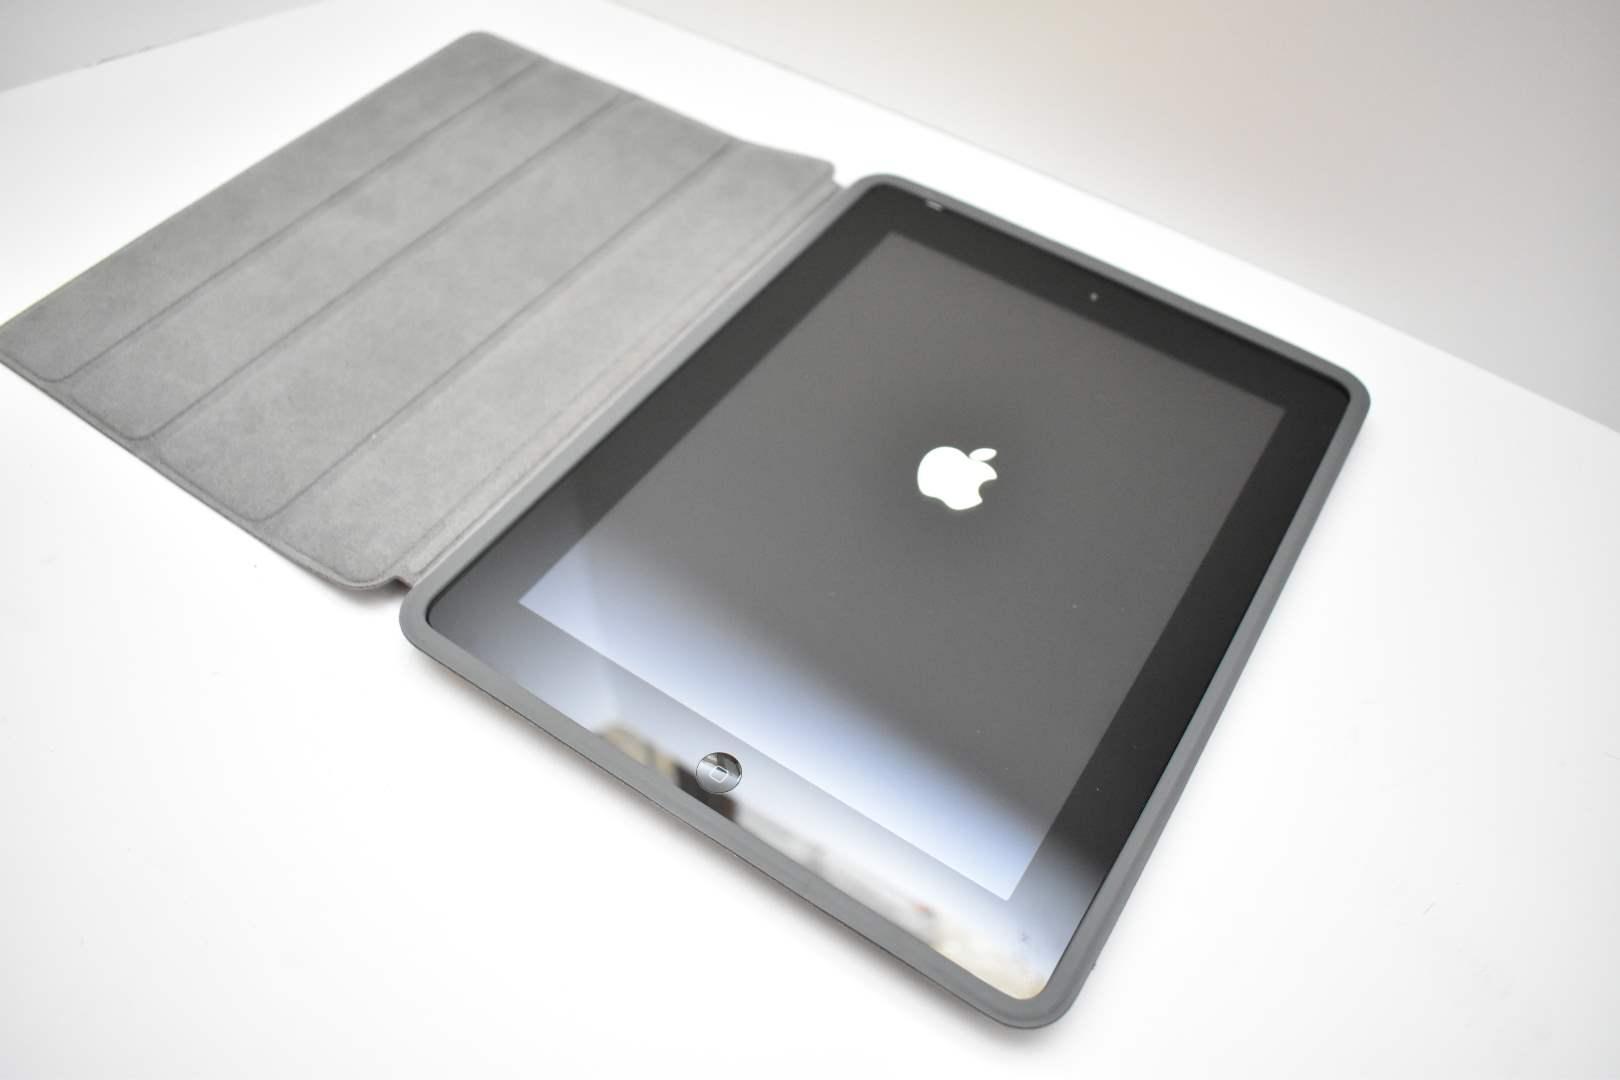 Ipad 2 with Case